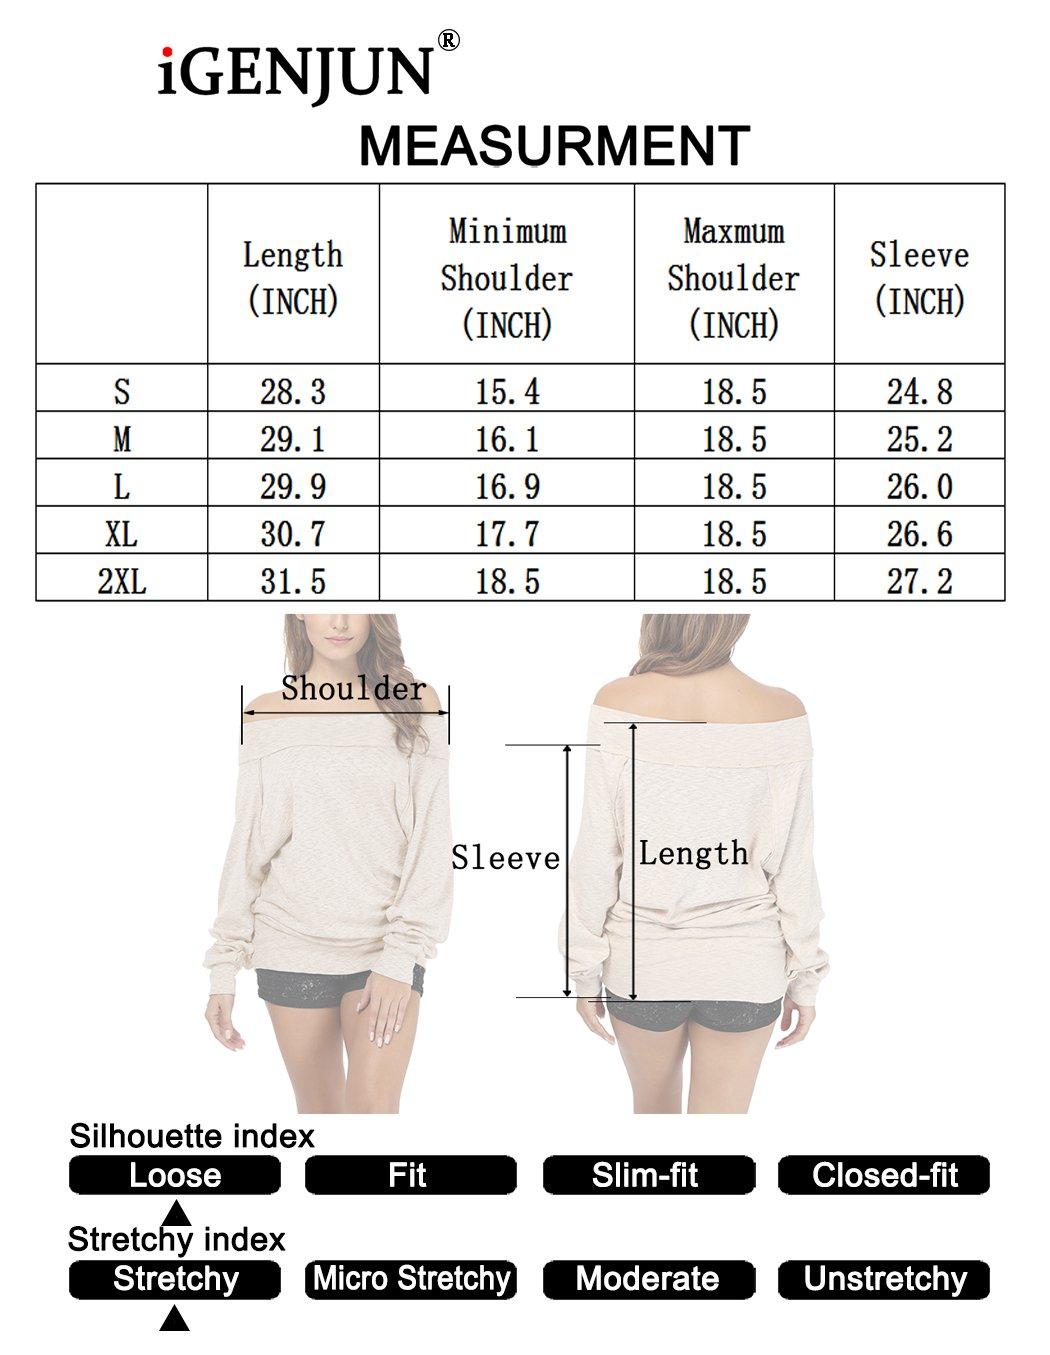 iGENJUN Women's Dolman Sleeve Off The Shoulder Sweater Shirt Tops,Black,M by iGENJUN (Image #5)